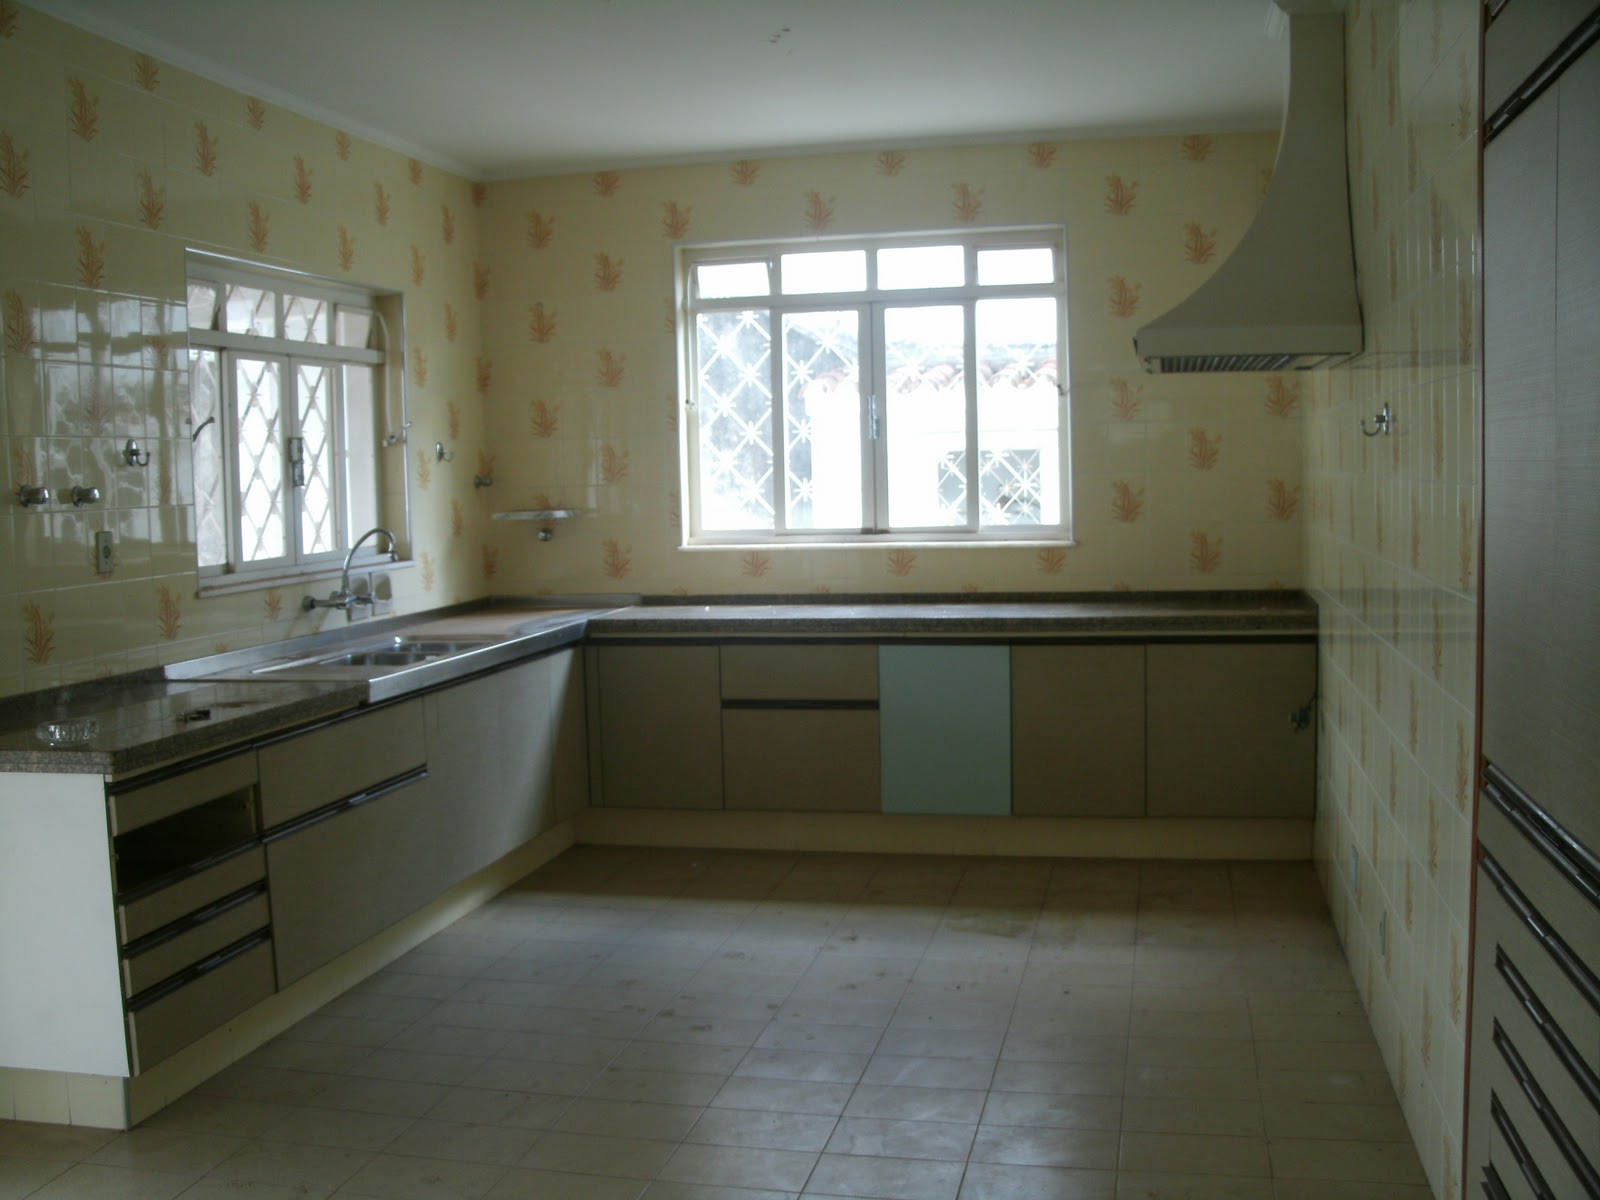 Casa e terreno à venda  Poços de Caldas, MG Dezembro 2011 # Armario De Cozinha Vai Ate O Teto